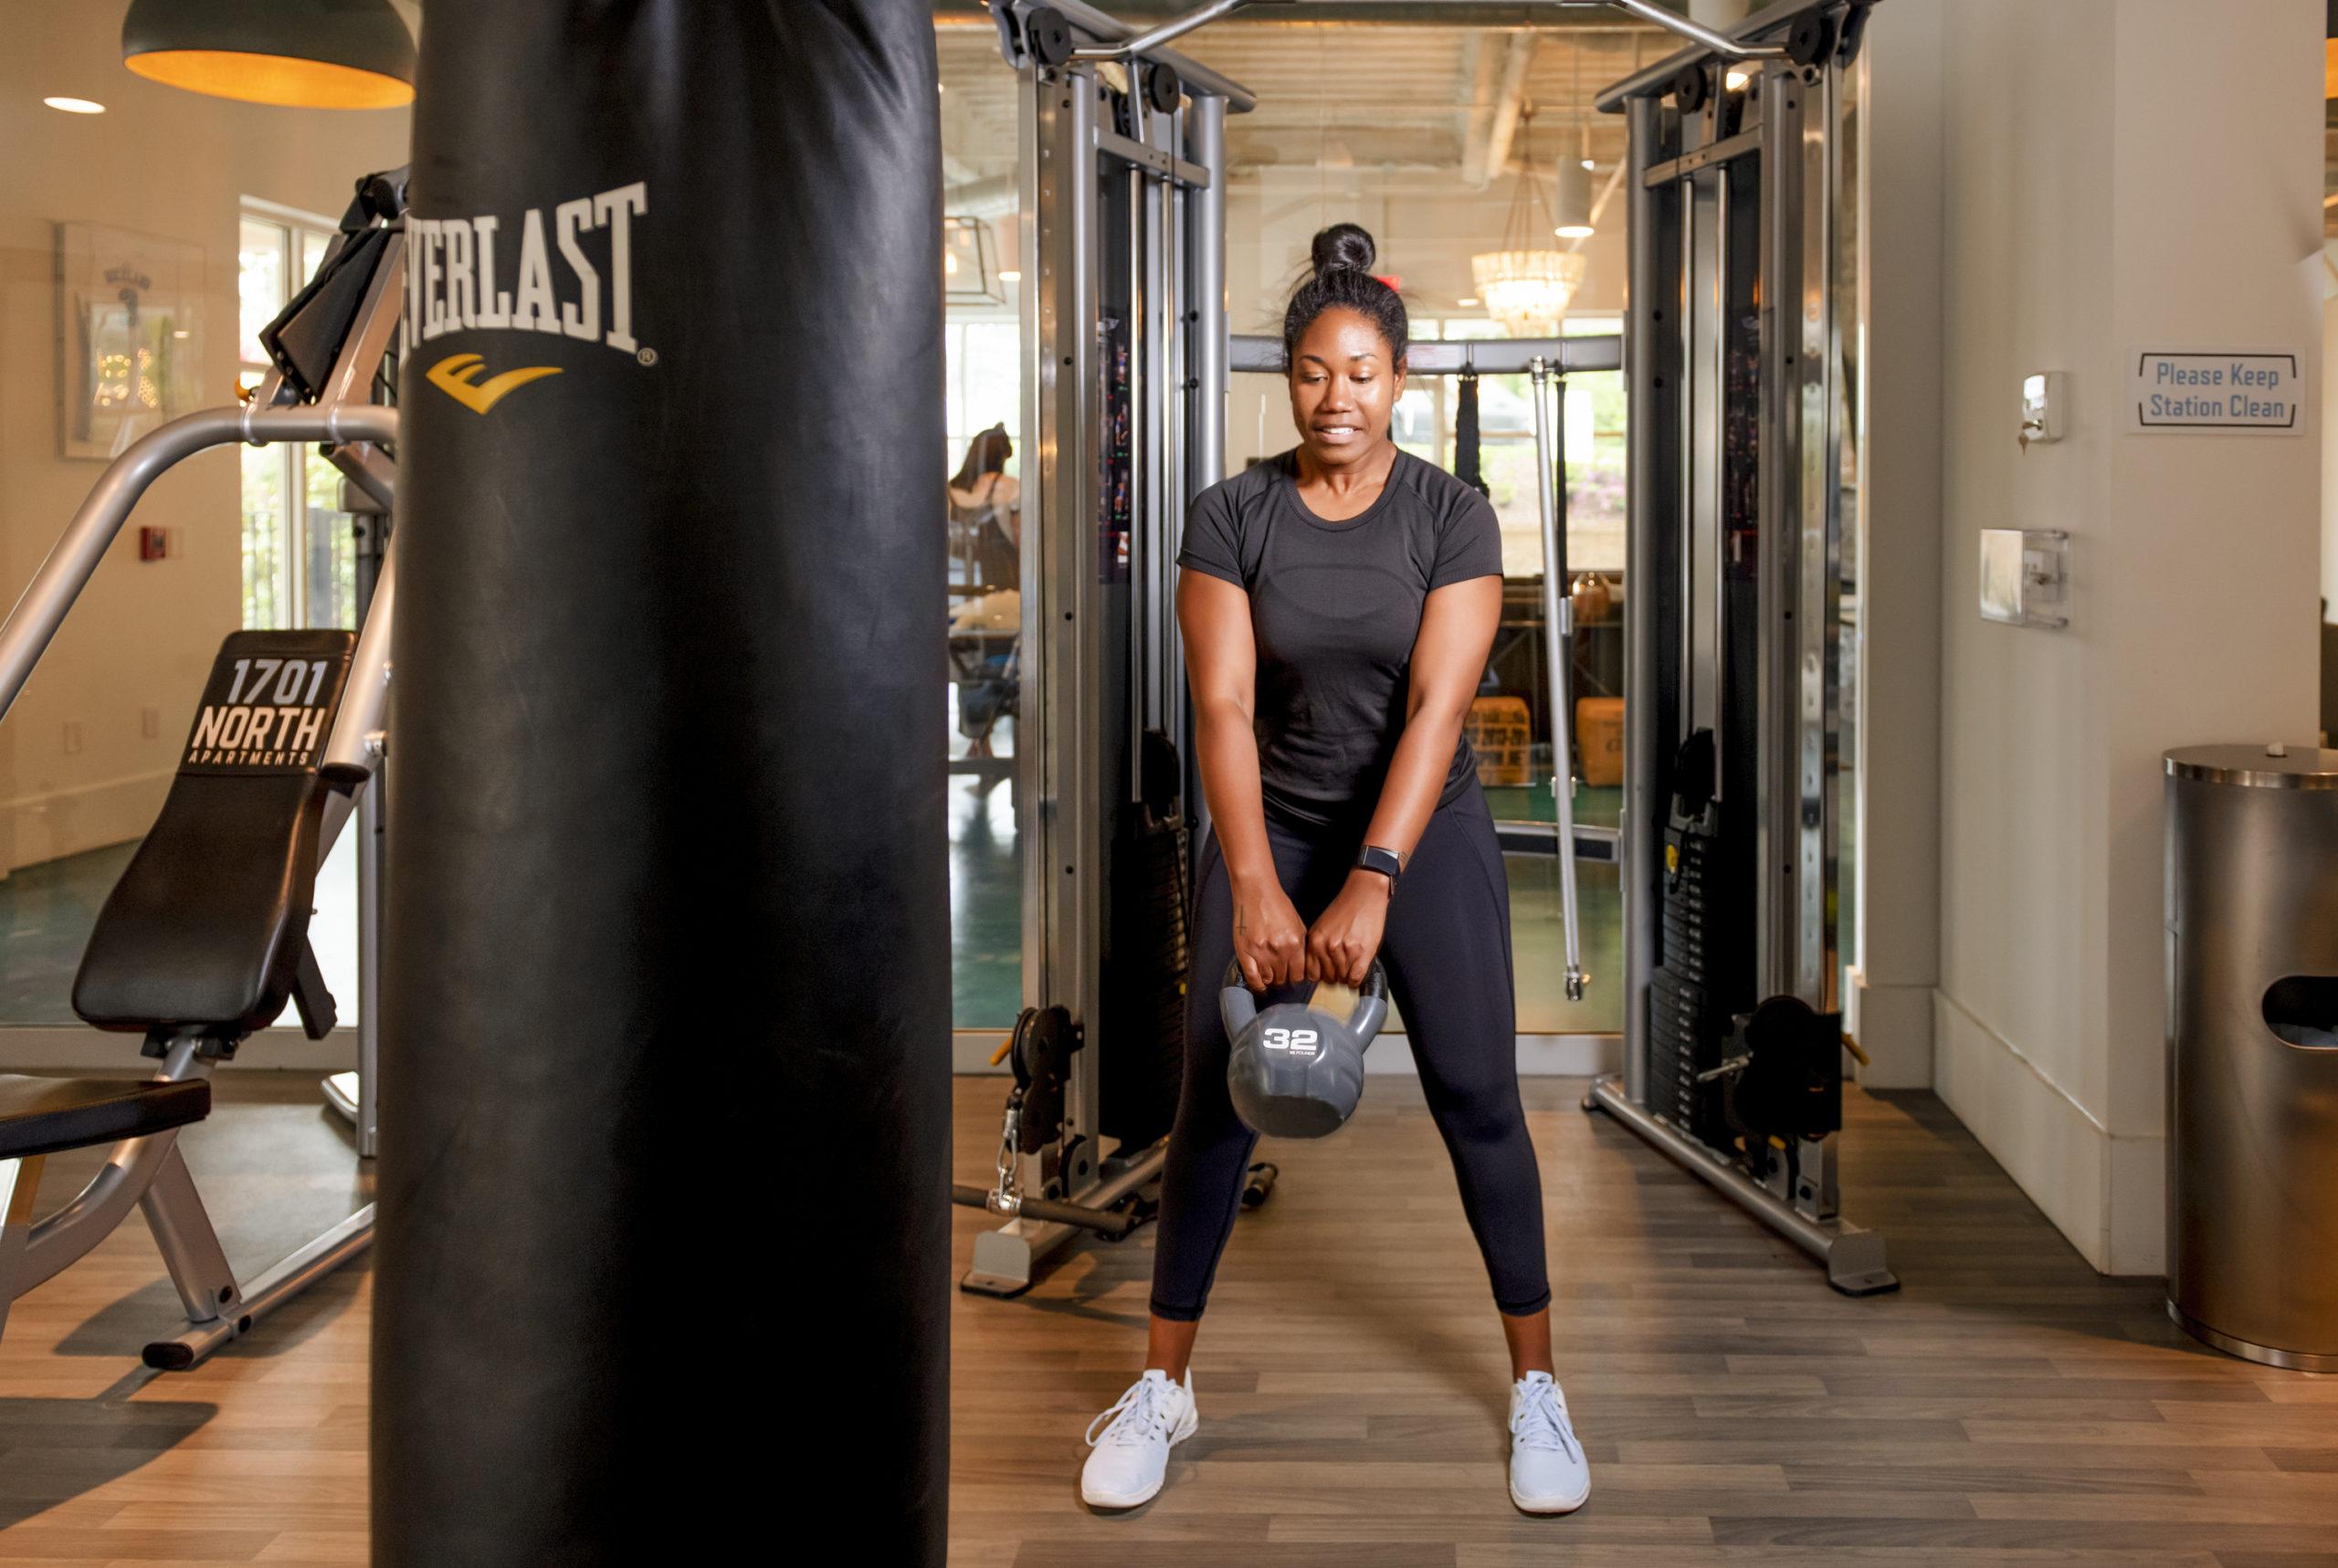 girl swinging kettlebell at evolve community new workout